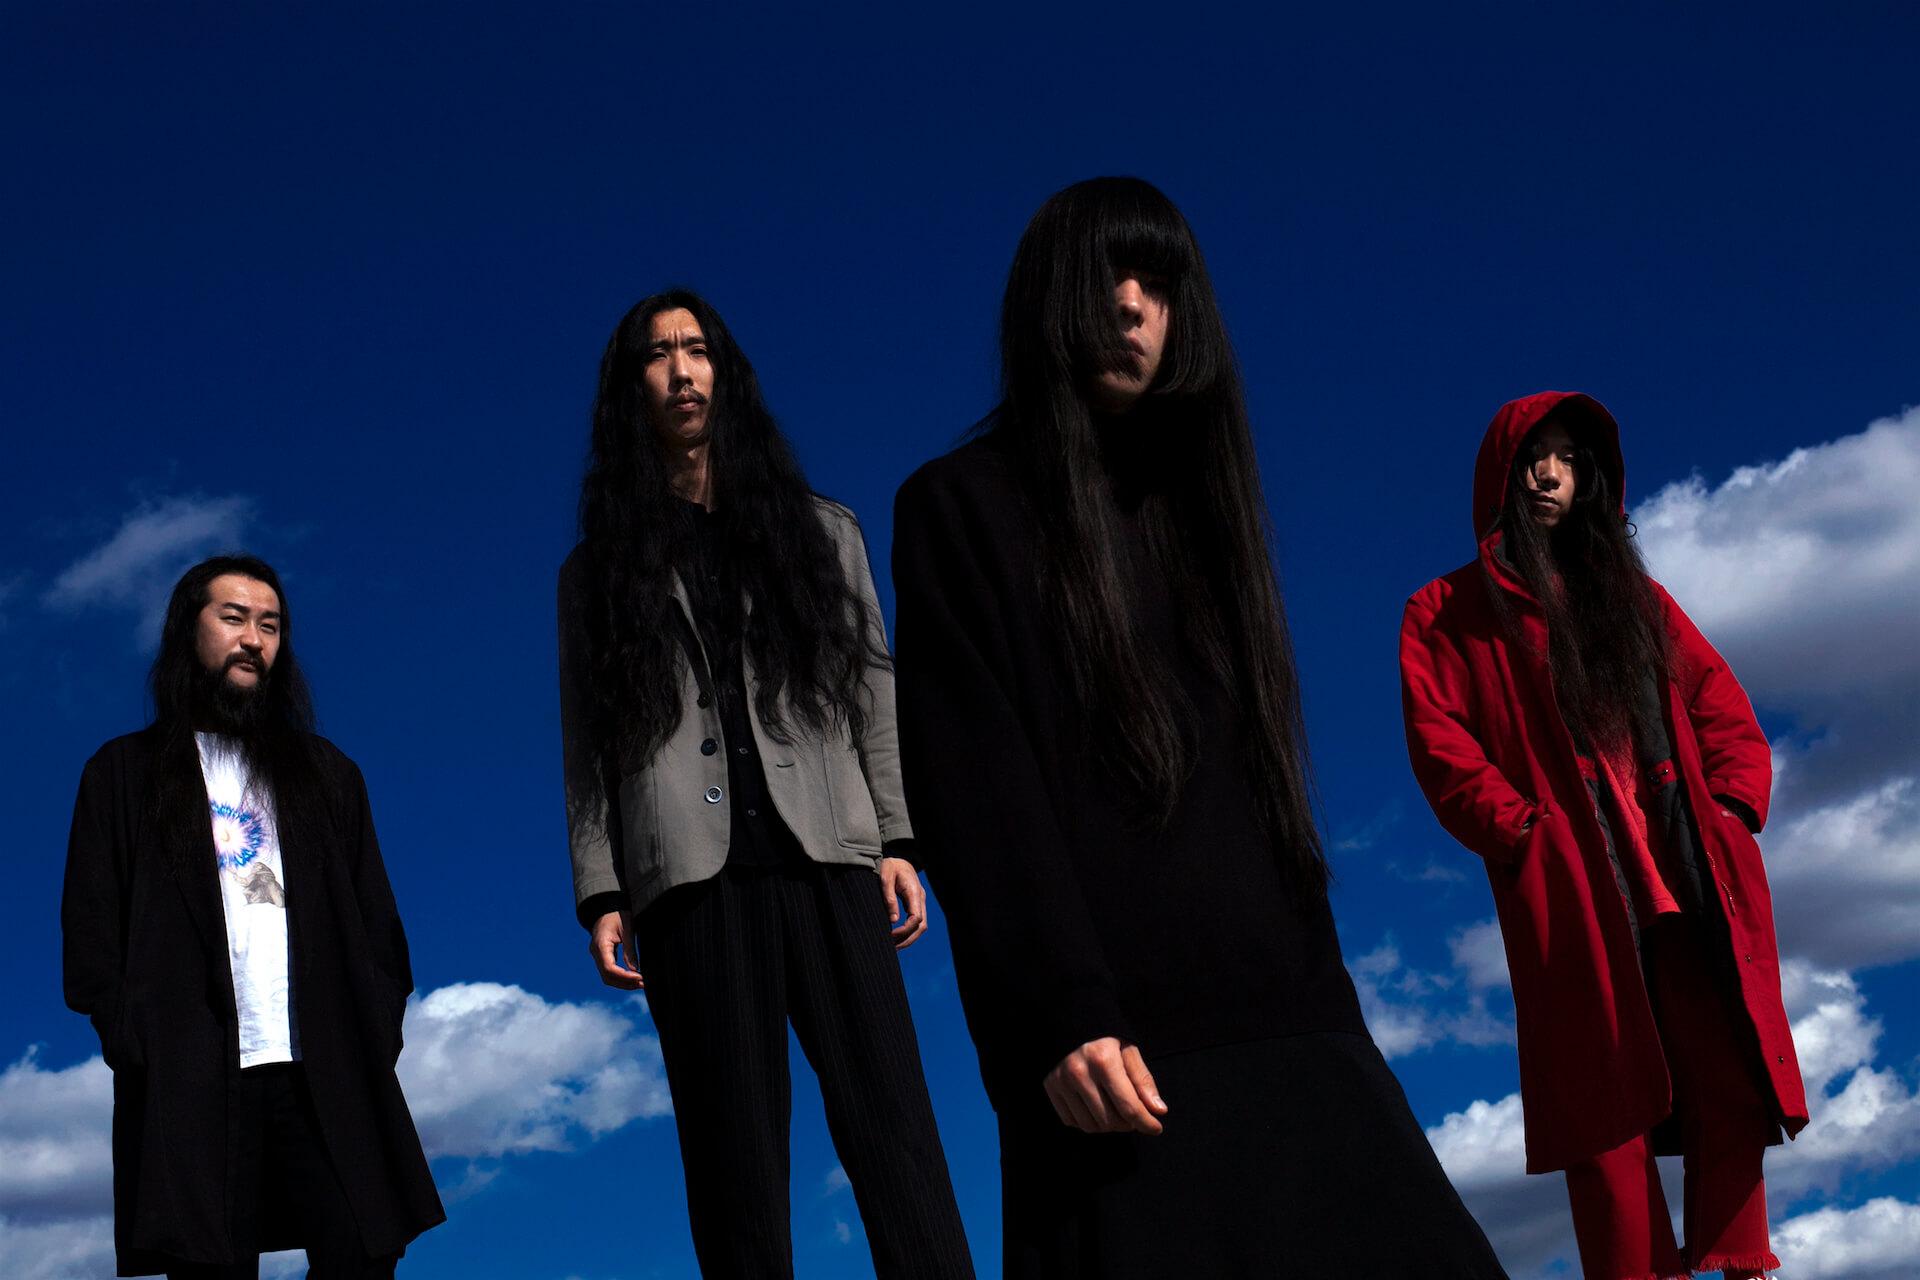 BO NINGENの4thアルバム『Sudden Fictions』がリリース決定!Primal ScreamのBobby Gillespieもゲスト参加 music201202_boningen_2